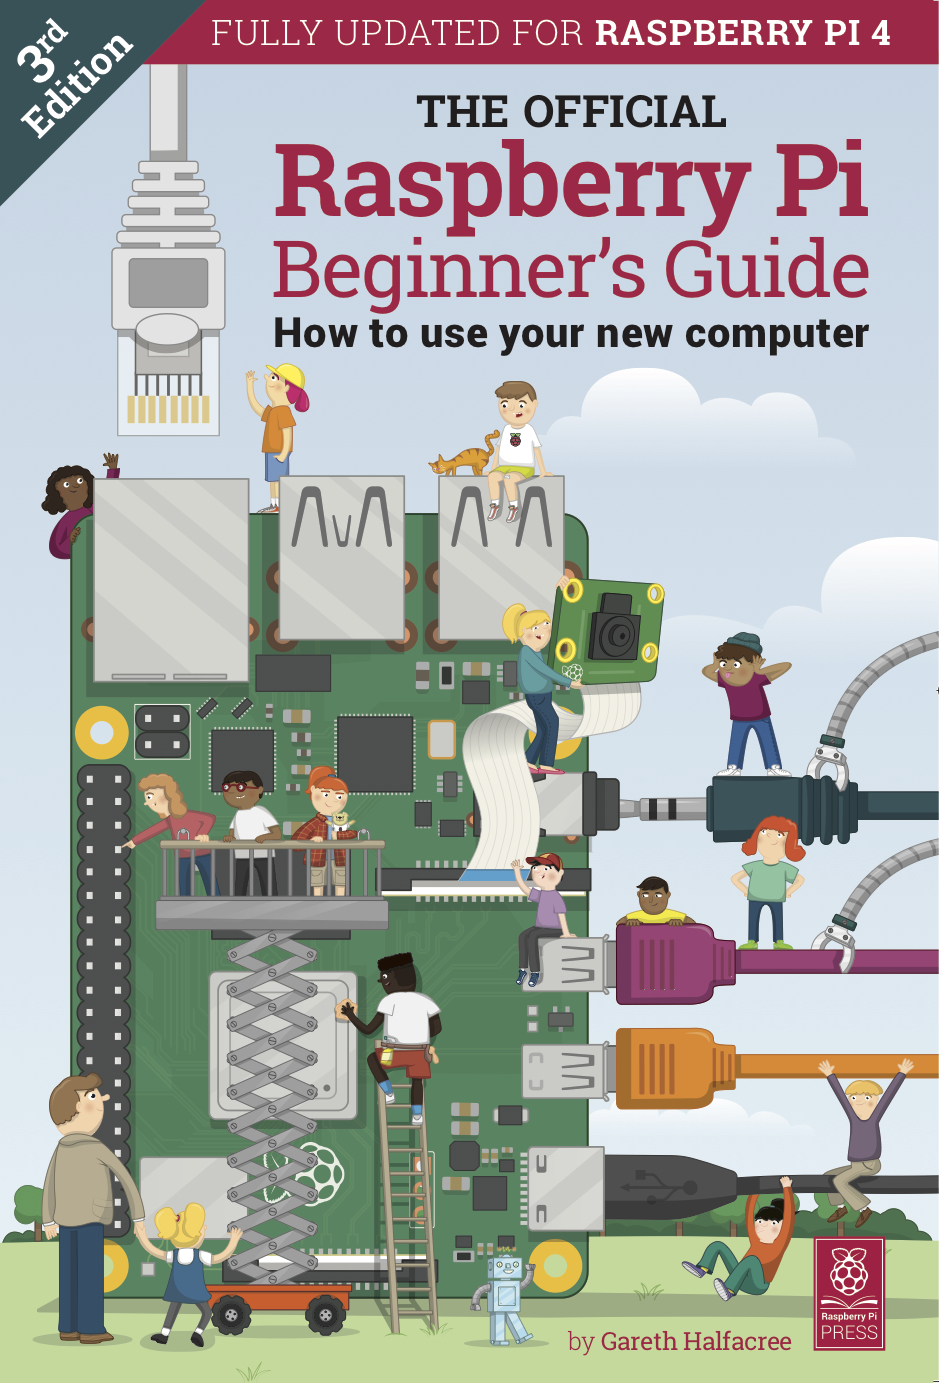 Raspberry Pi Beginner's Guide v3 — The MagPi magazine